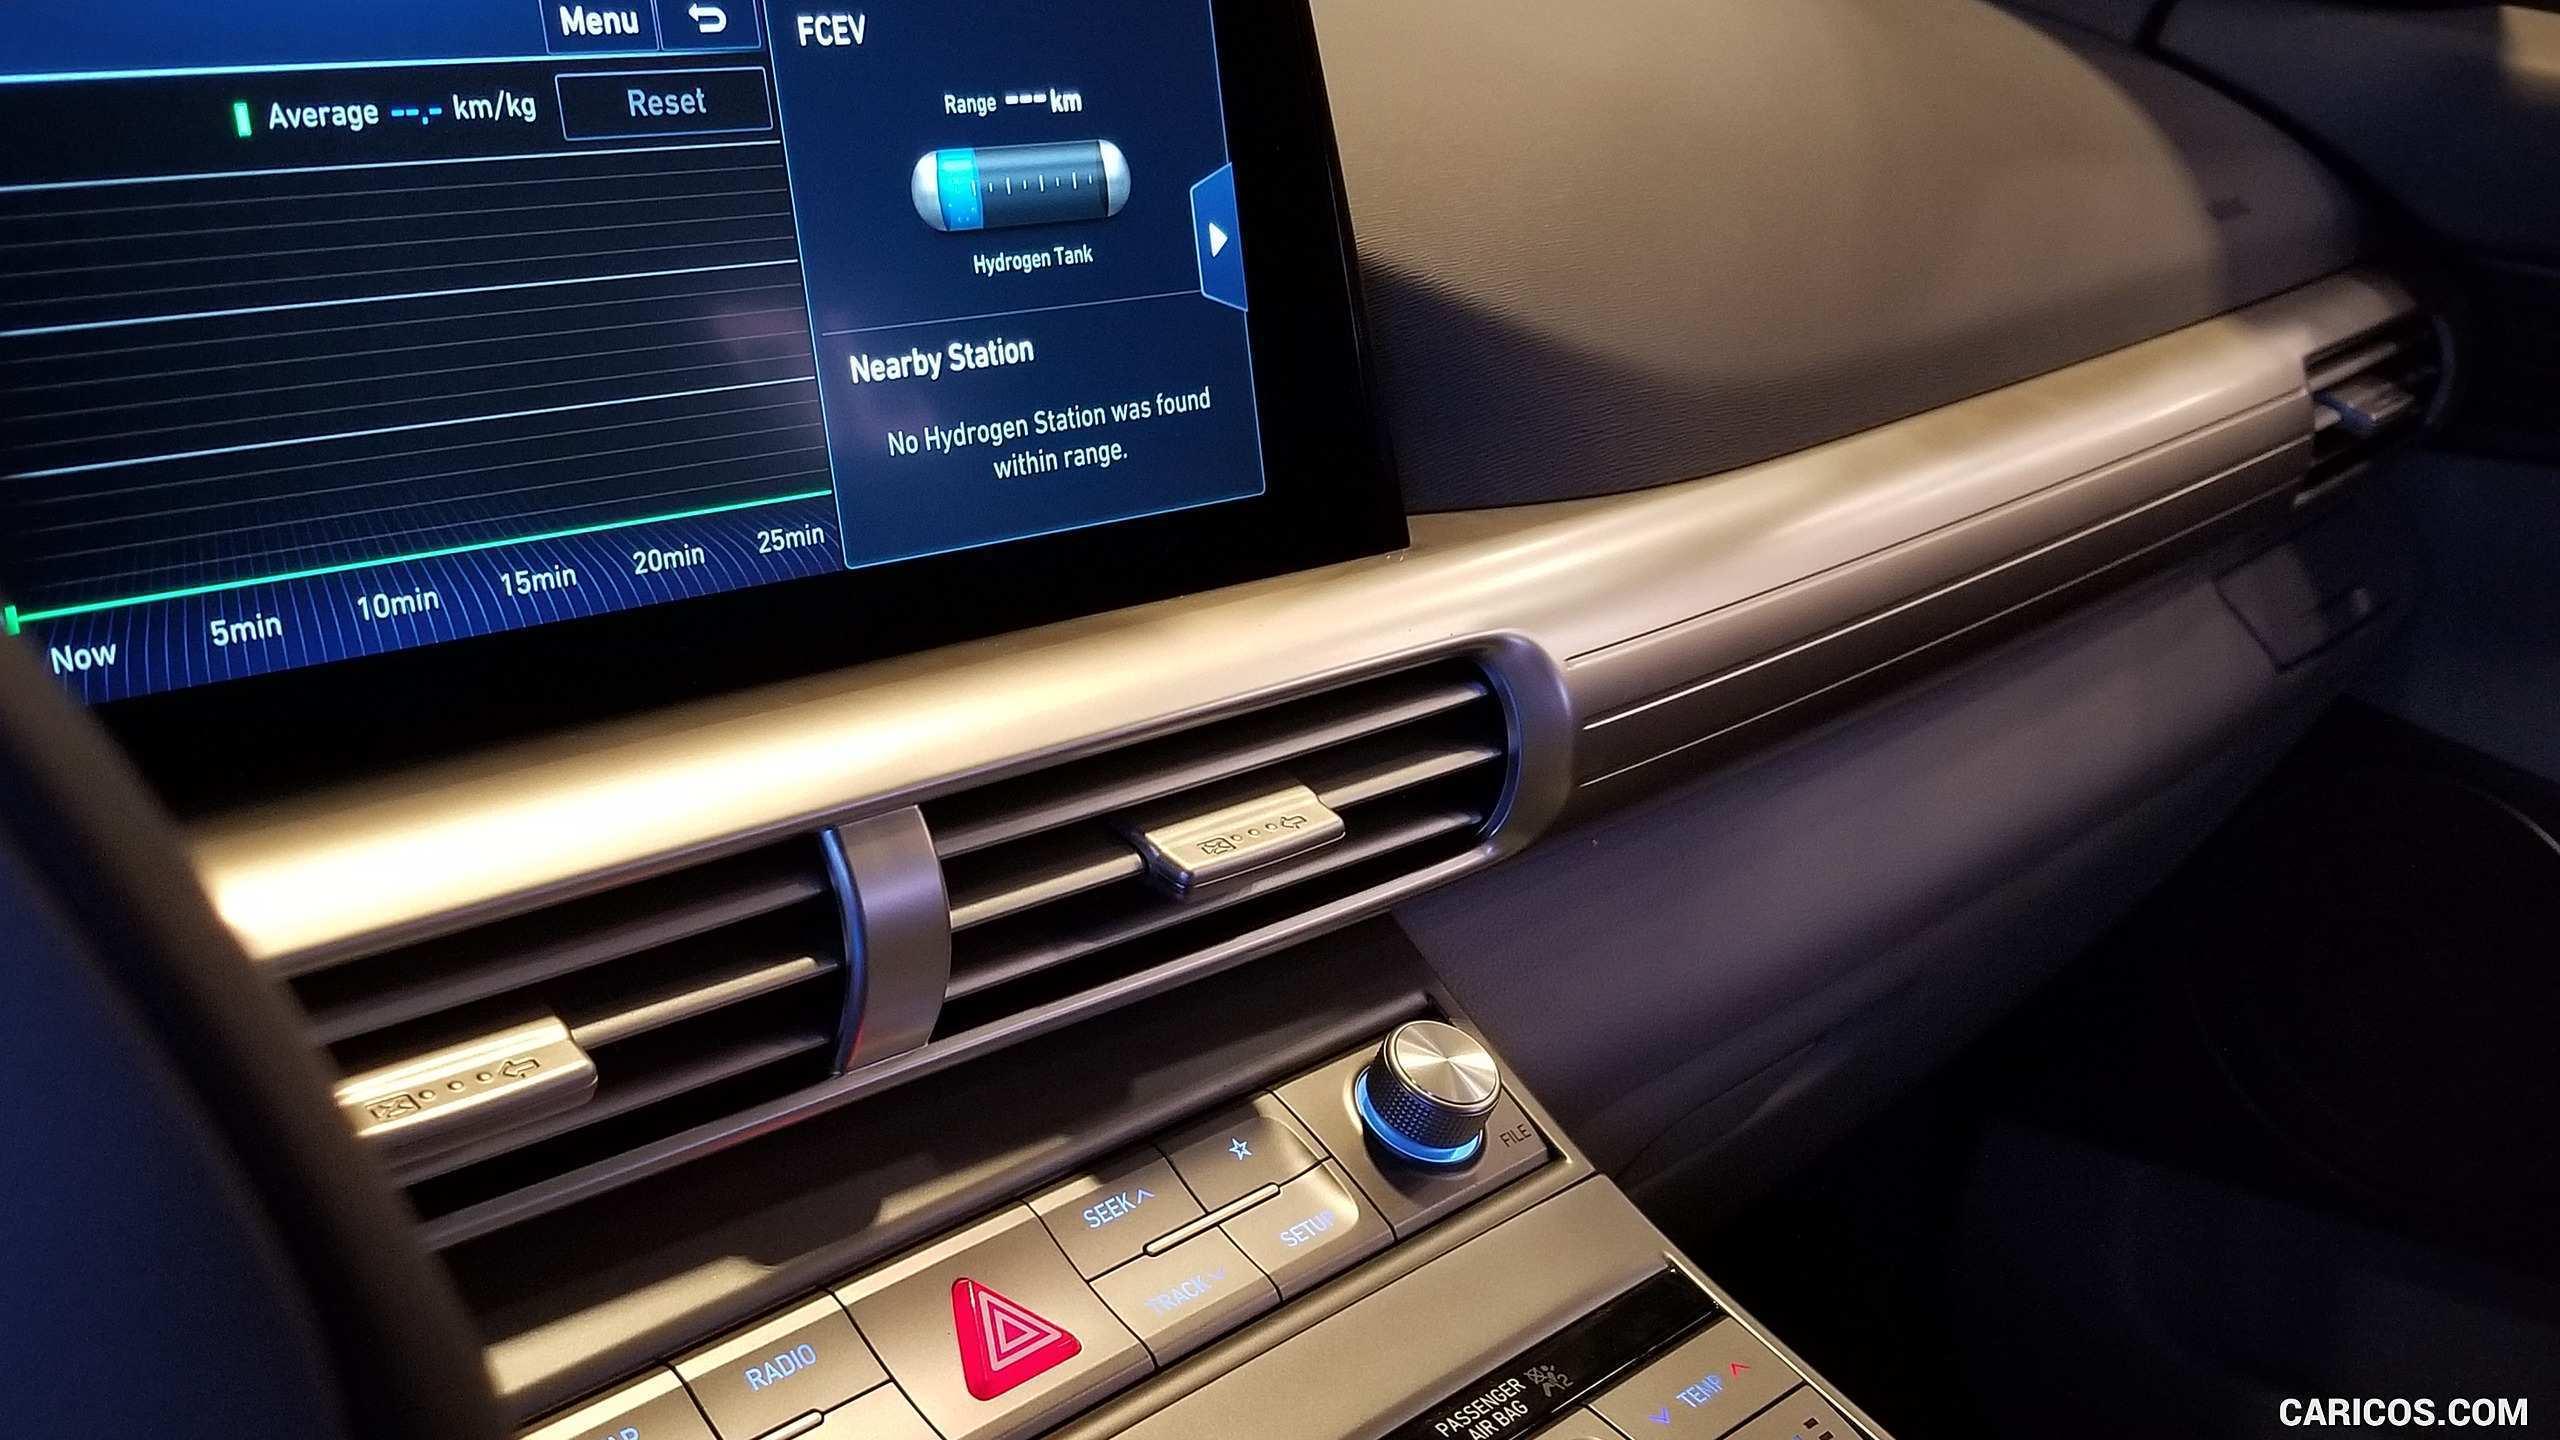 49 Concept of 2019 Hyundai Nexo Interior Pictures with 2019 Hyundai Nexo Interior